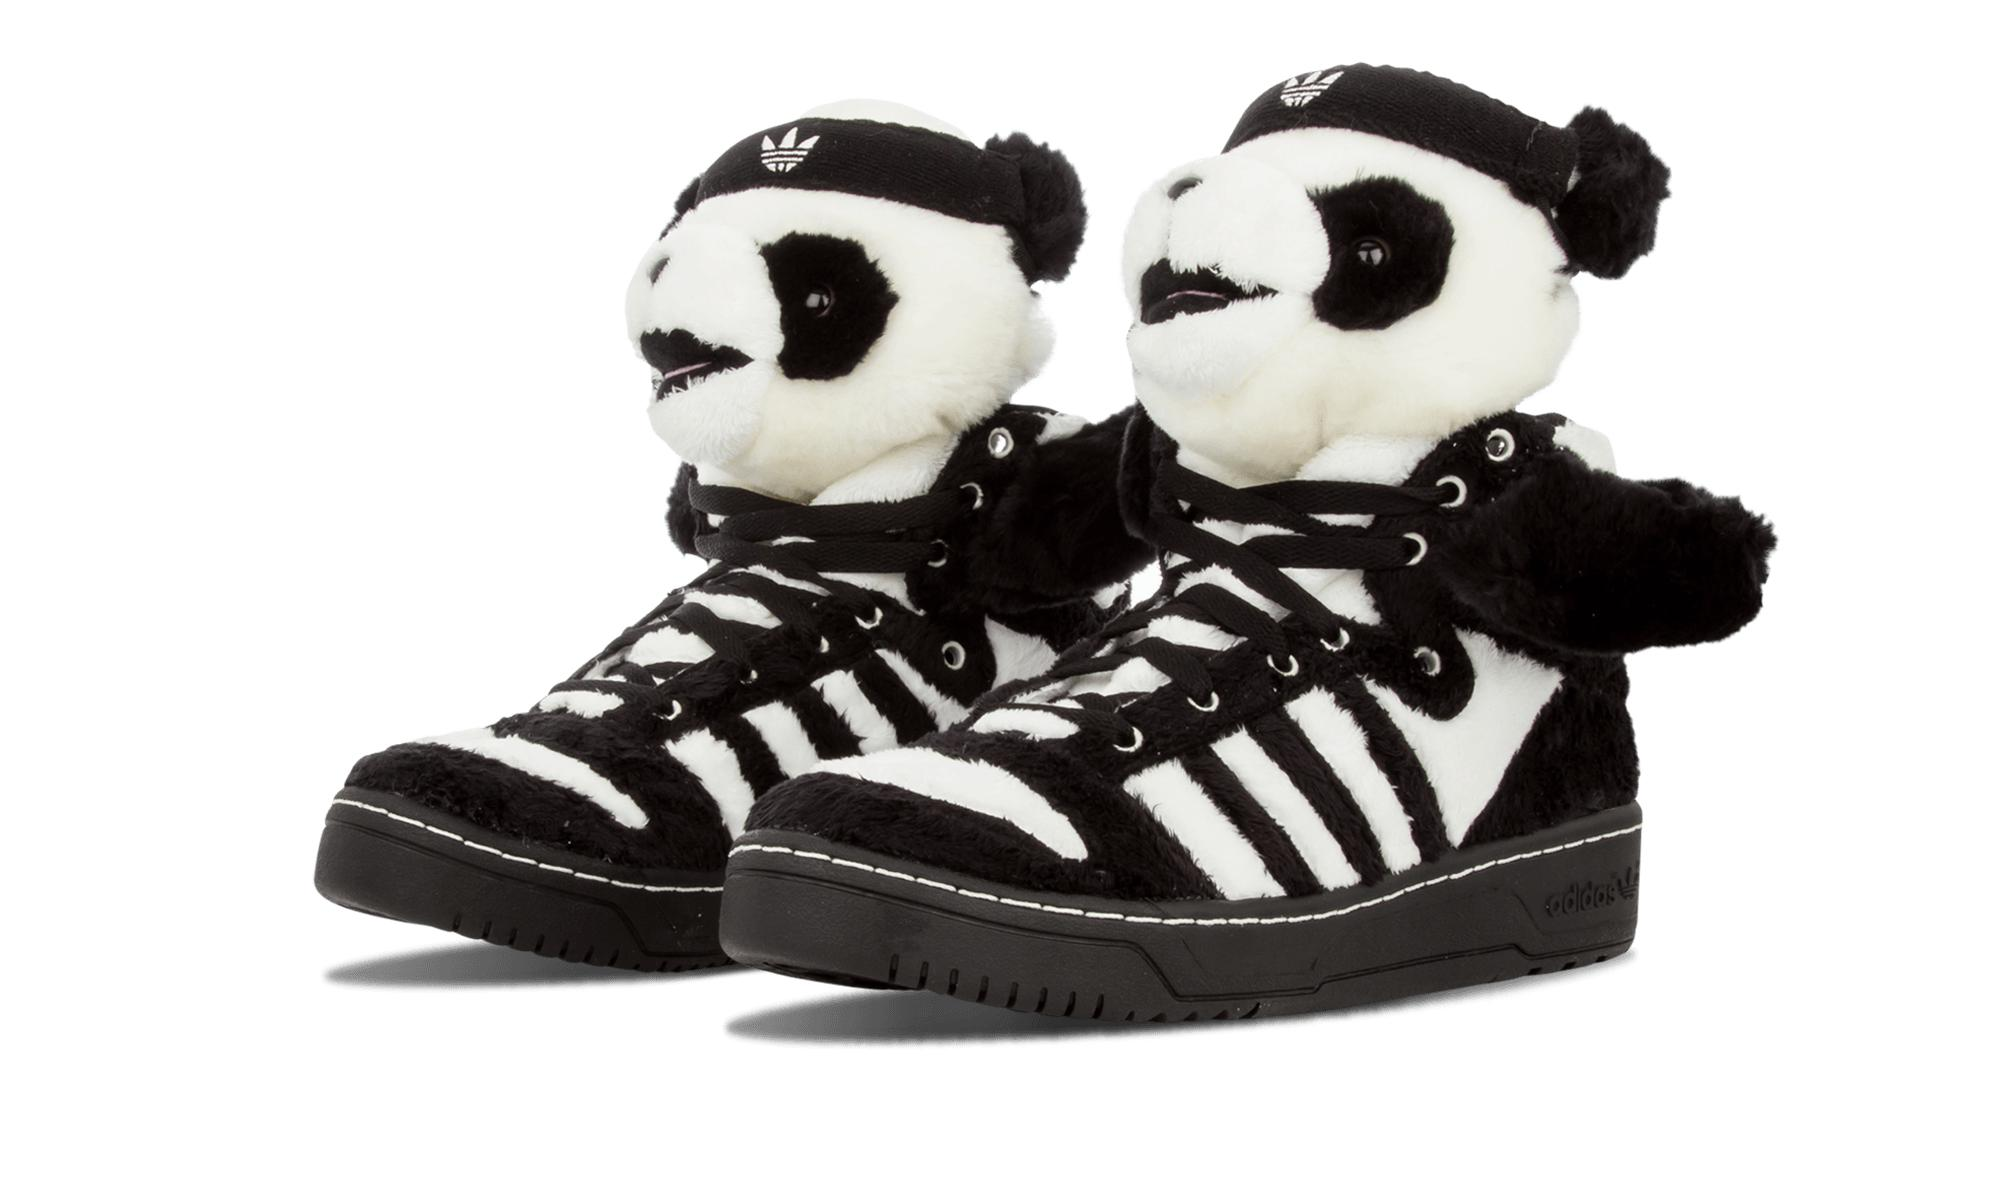 71abeee06fa3 Lyst - adidas Js Panda Bear in White for Men